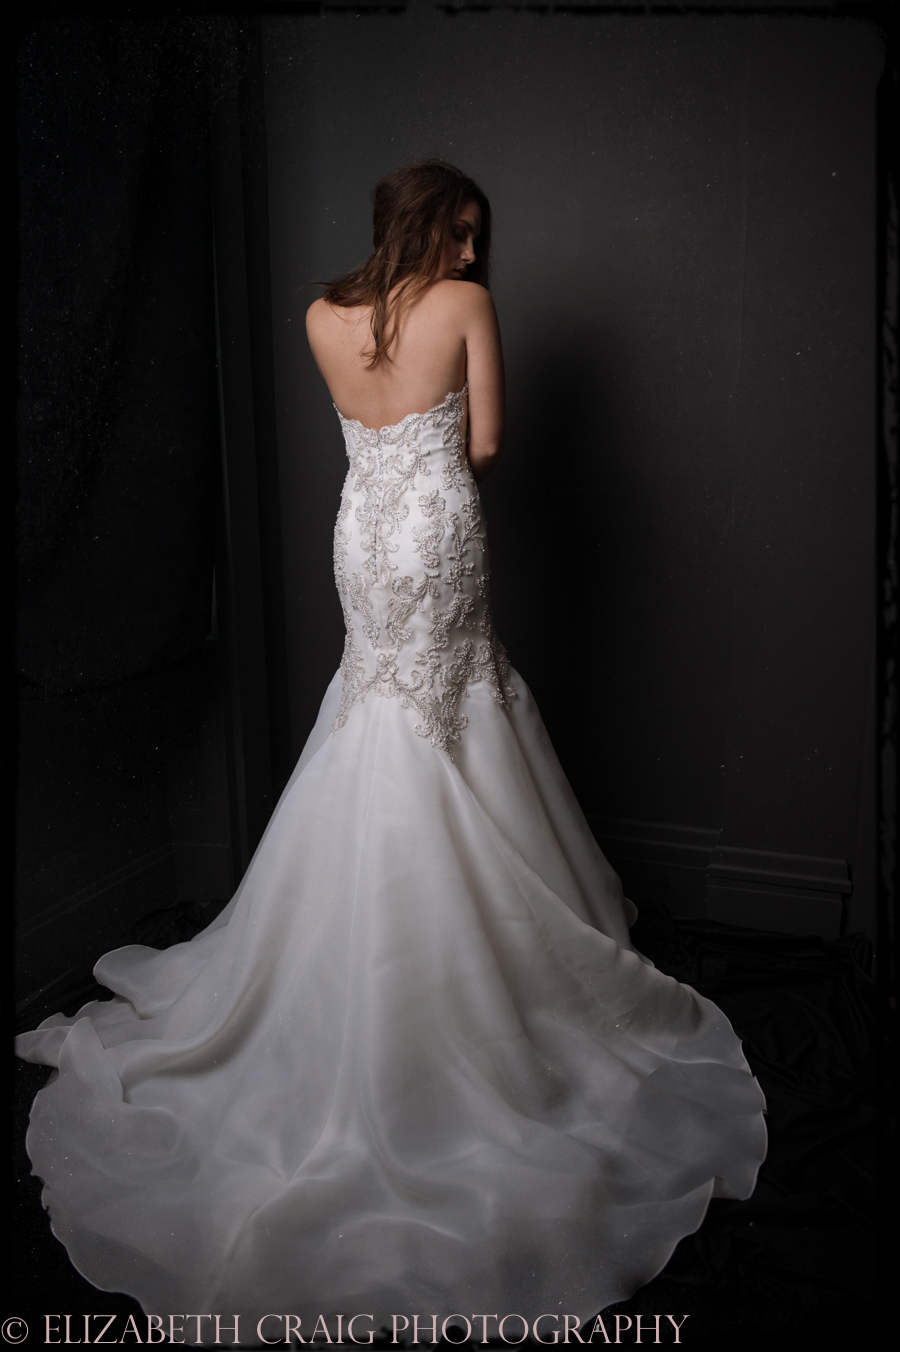 pittsburgh-boudoir-photographer-pittsburgh-wedding-photographer-elizabeth-craig-photography-007